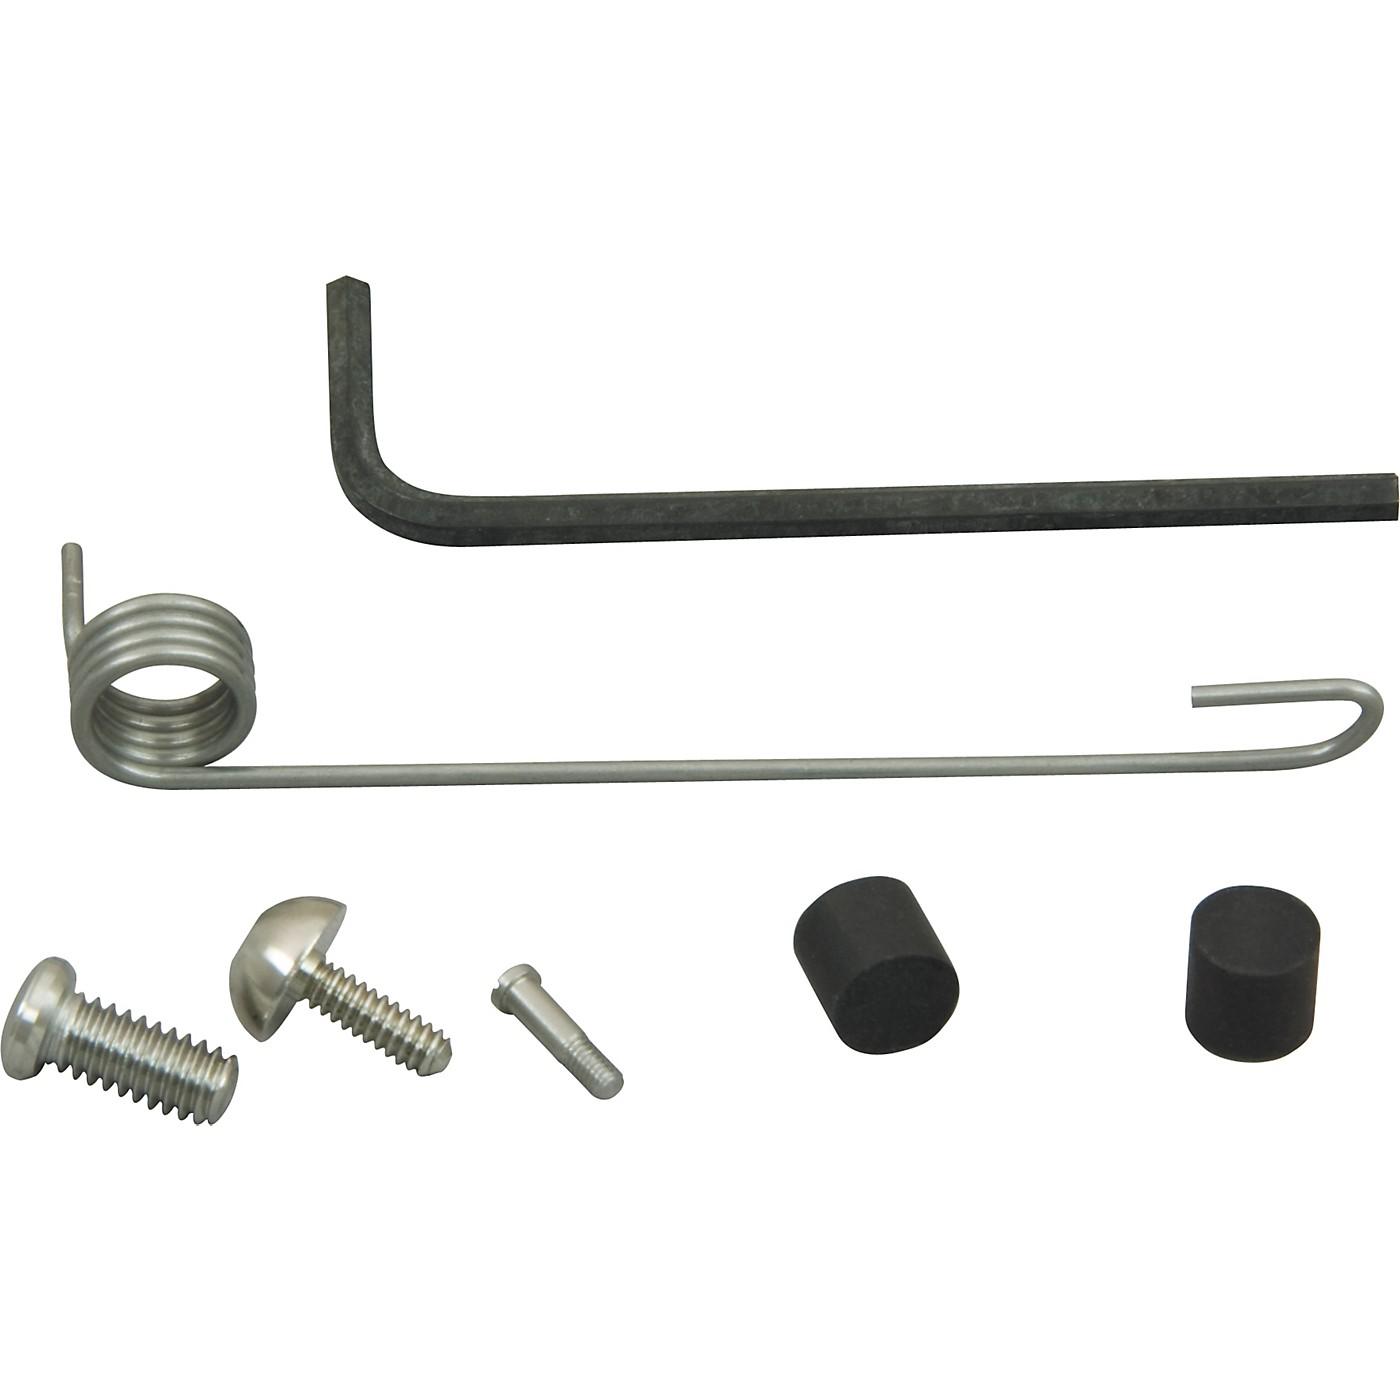 Getzen AC-G-115 Axial Flow Valve Service Parts Kit thumbnail